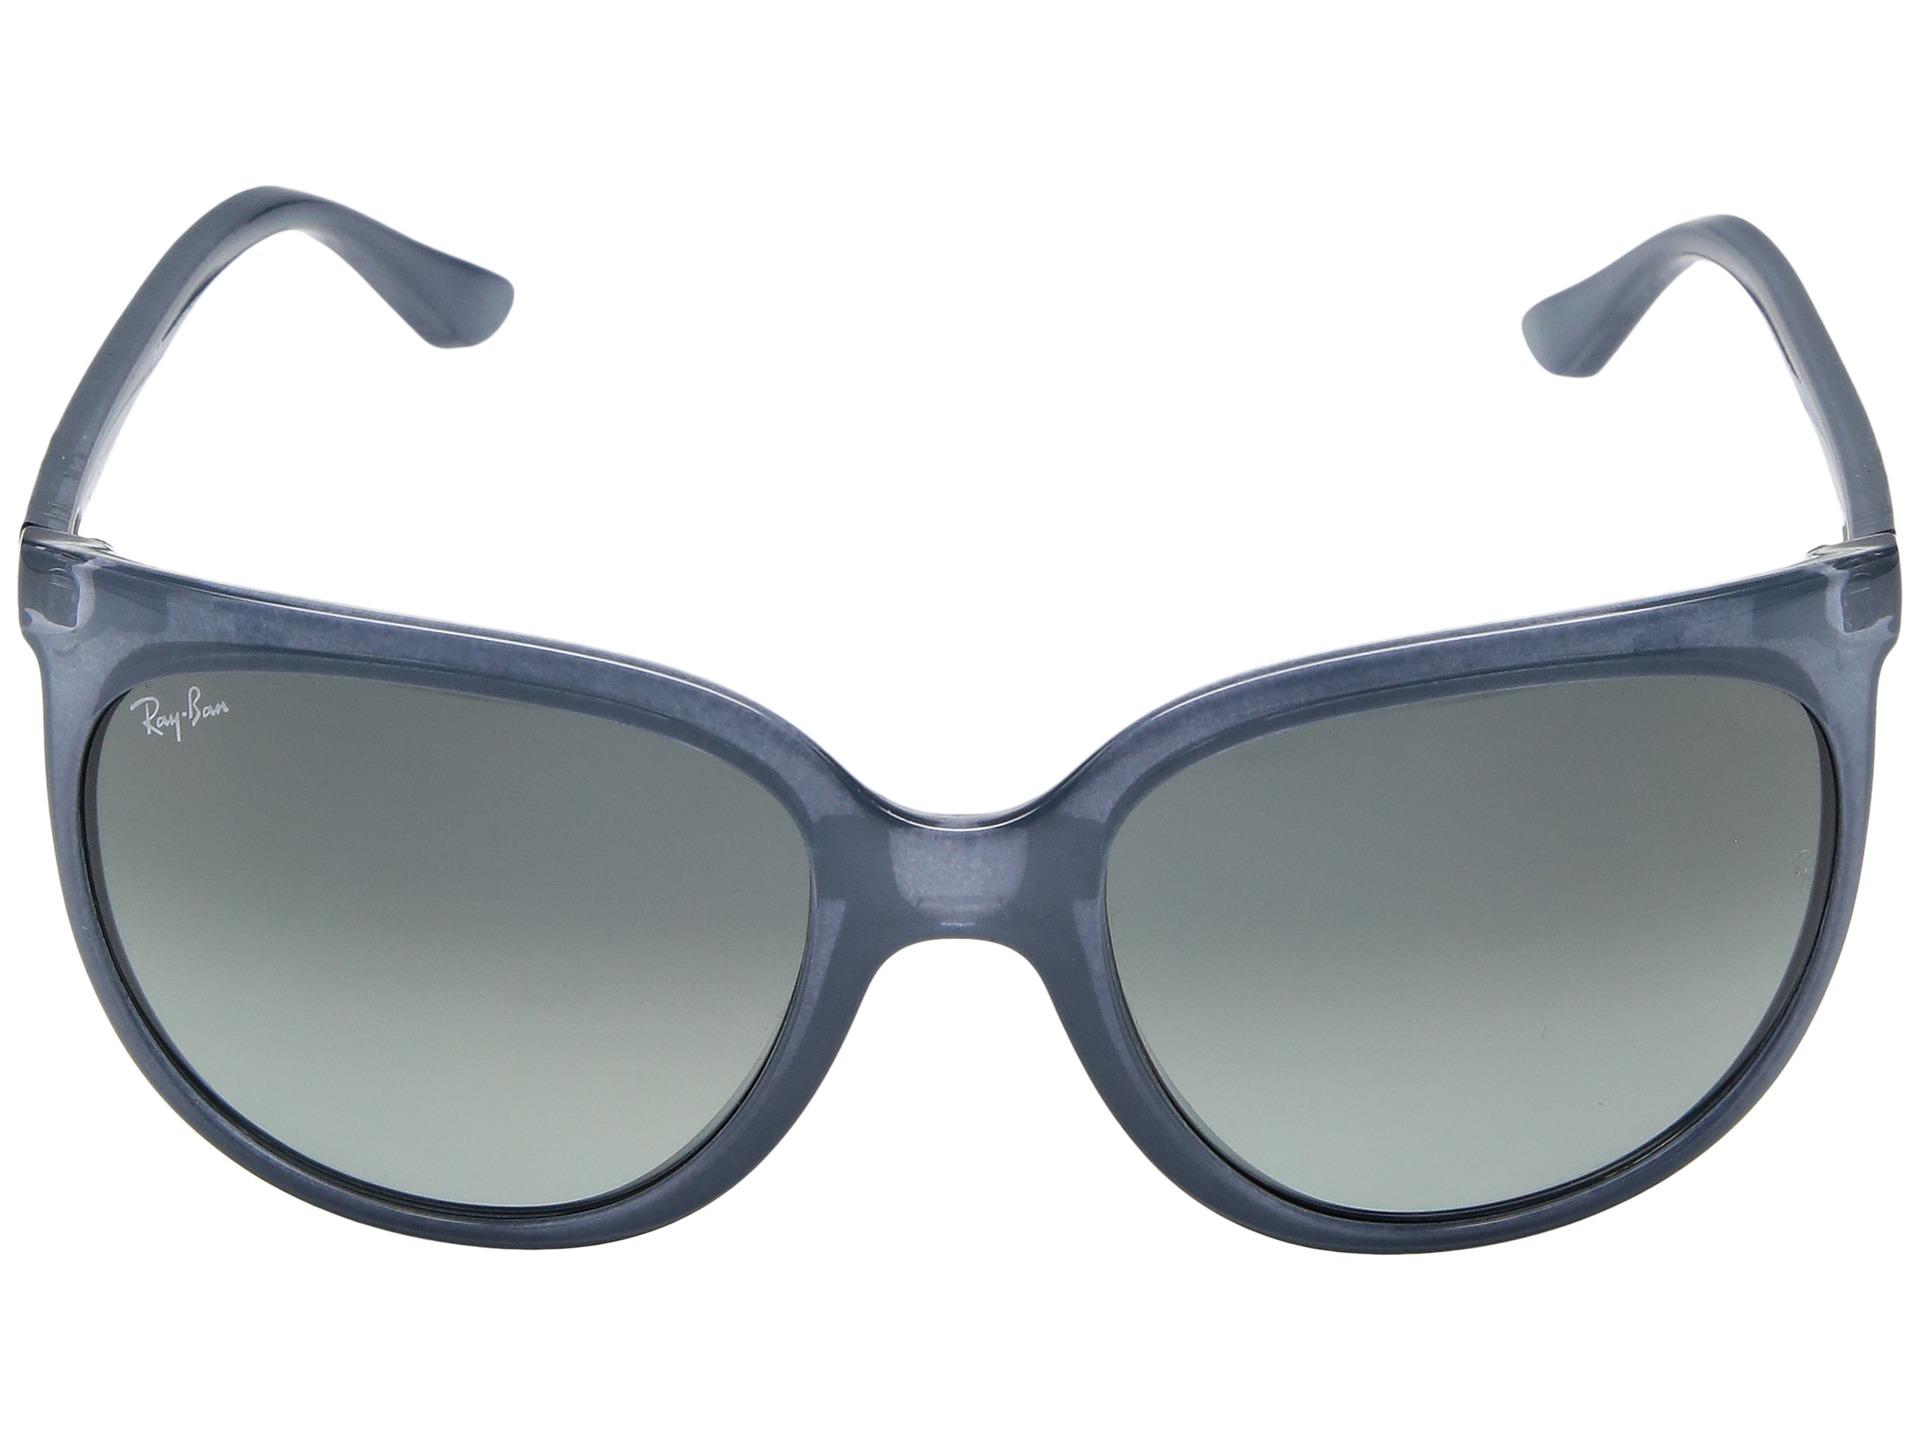 2f7e19fc5cd Ray Ban Womens Rb4126 57mm Cats 1000 Sunglasses « Heritage Malta